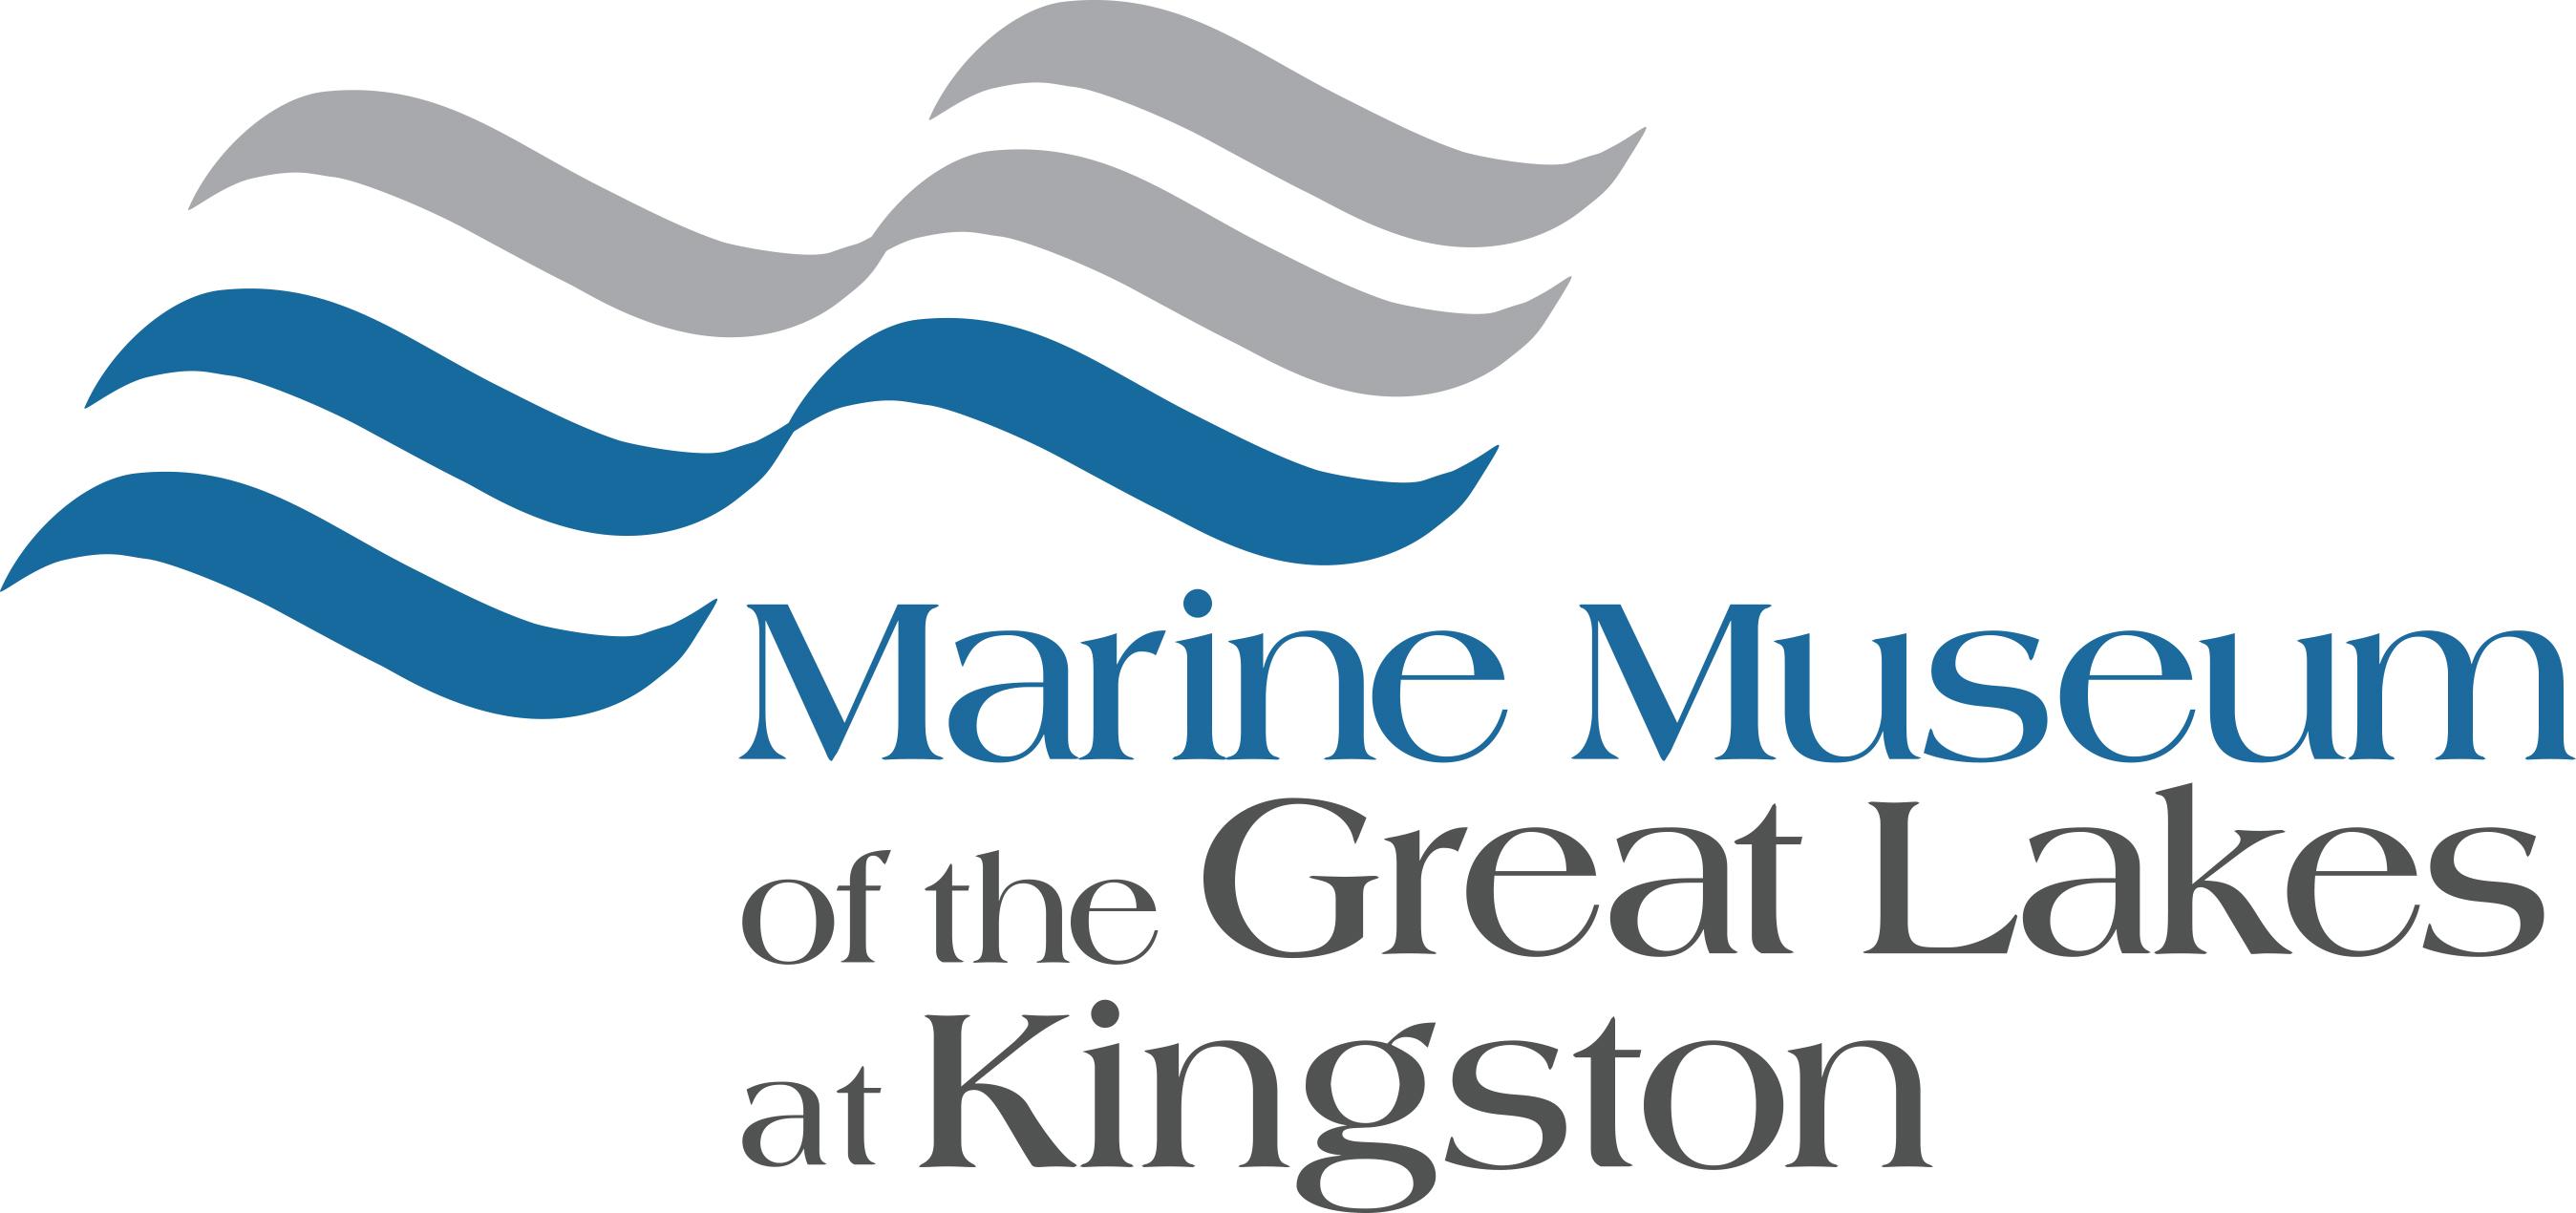 Marine Museum - Doug Cowie, Curator